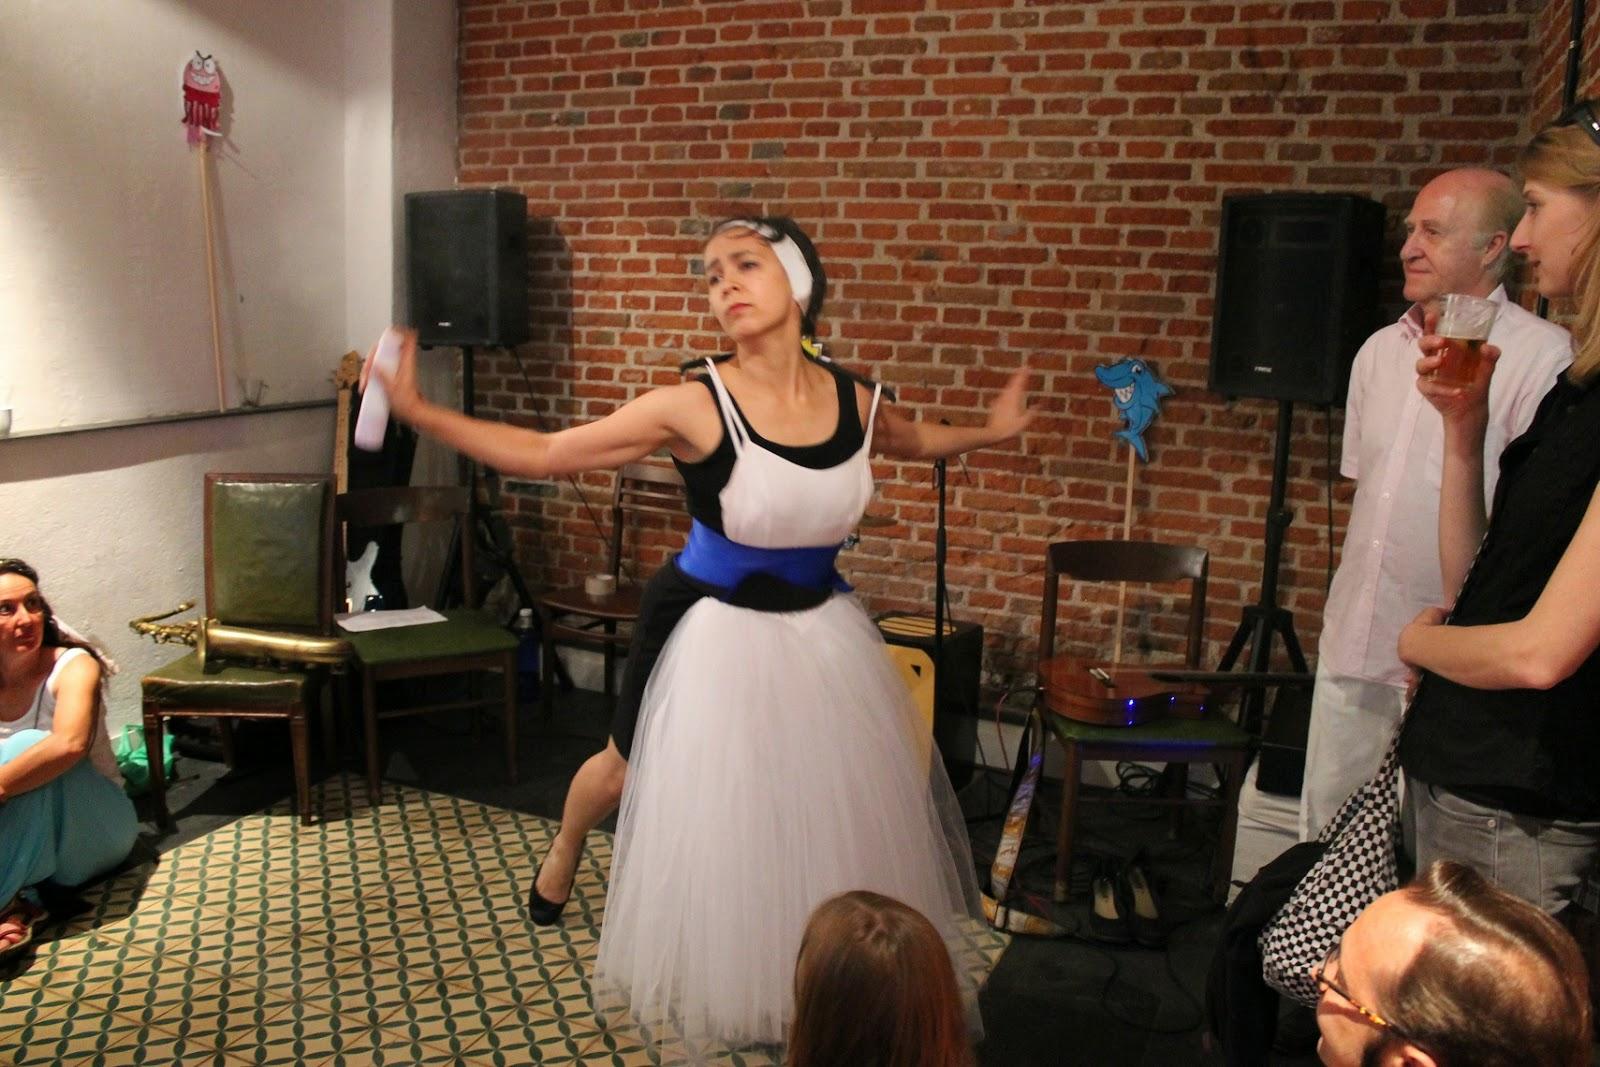 La Medusa, The Refrescos, Presentación VideoClip, Street Style, Life Style, Carmen Hummer, Music, Blog de moda